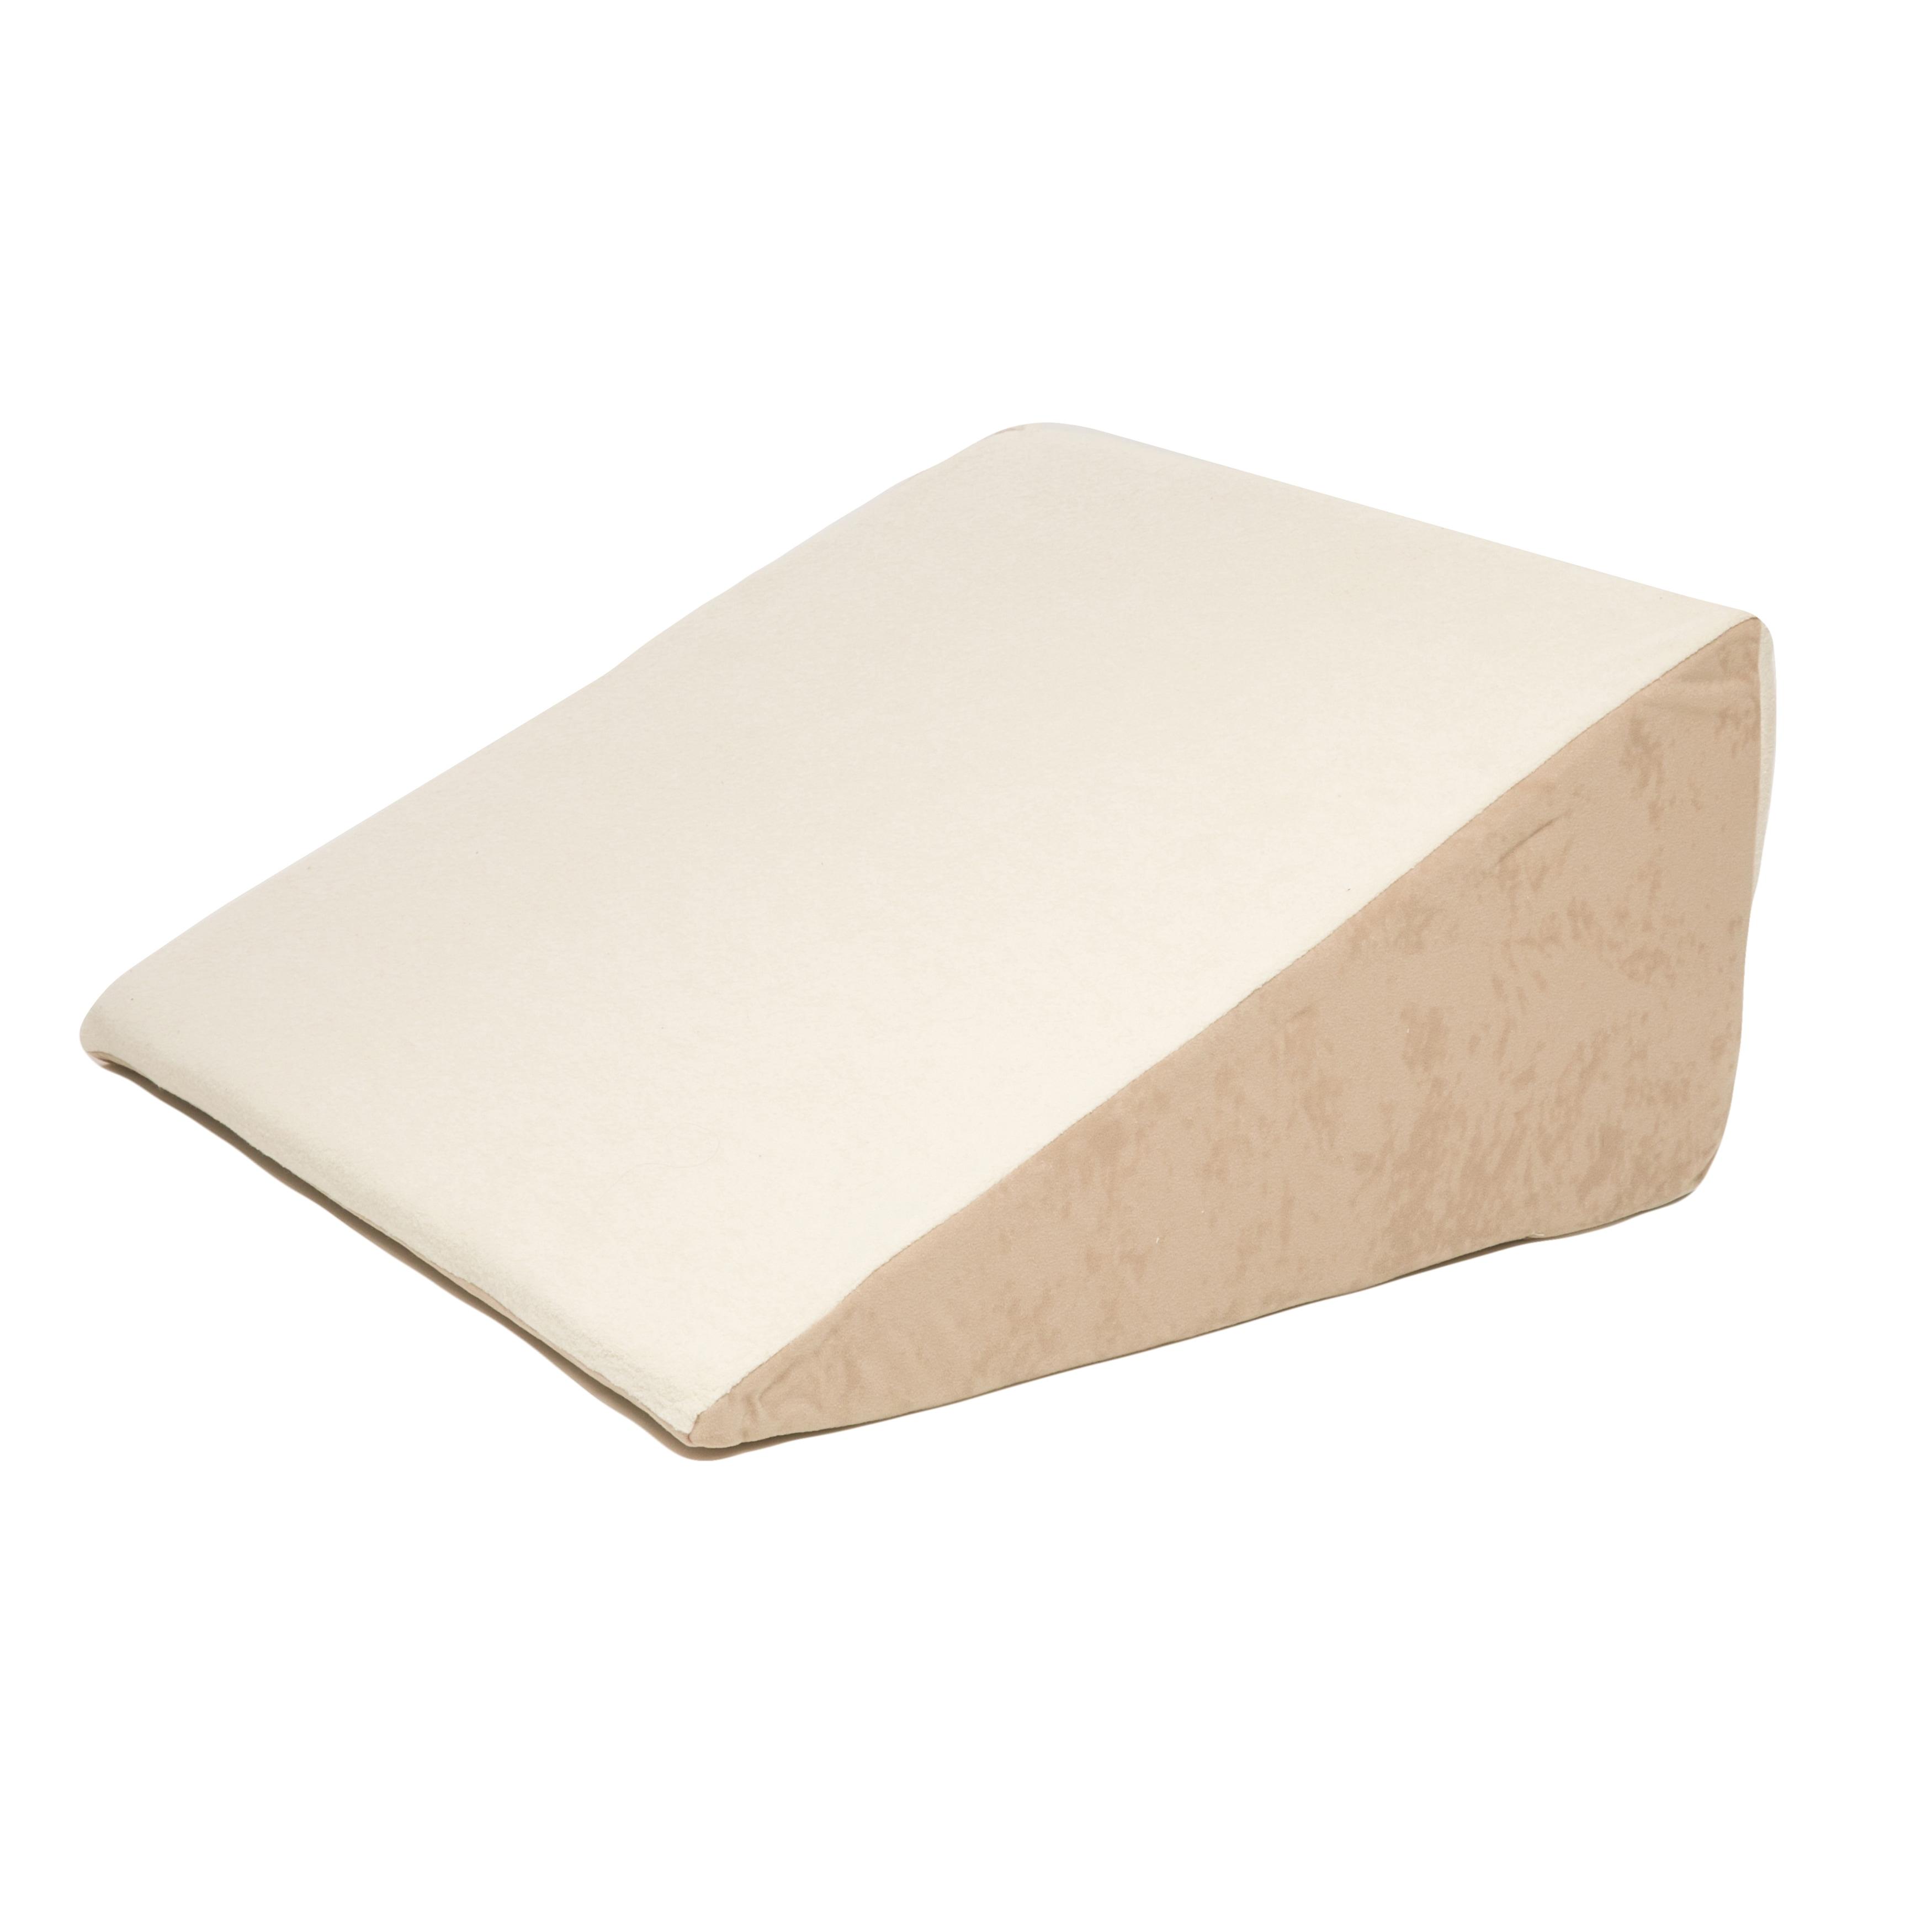 Deluxe Comfort Memory Foam Bed Wedge with Beige Sherpa Co...